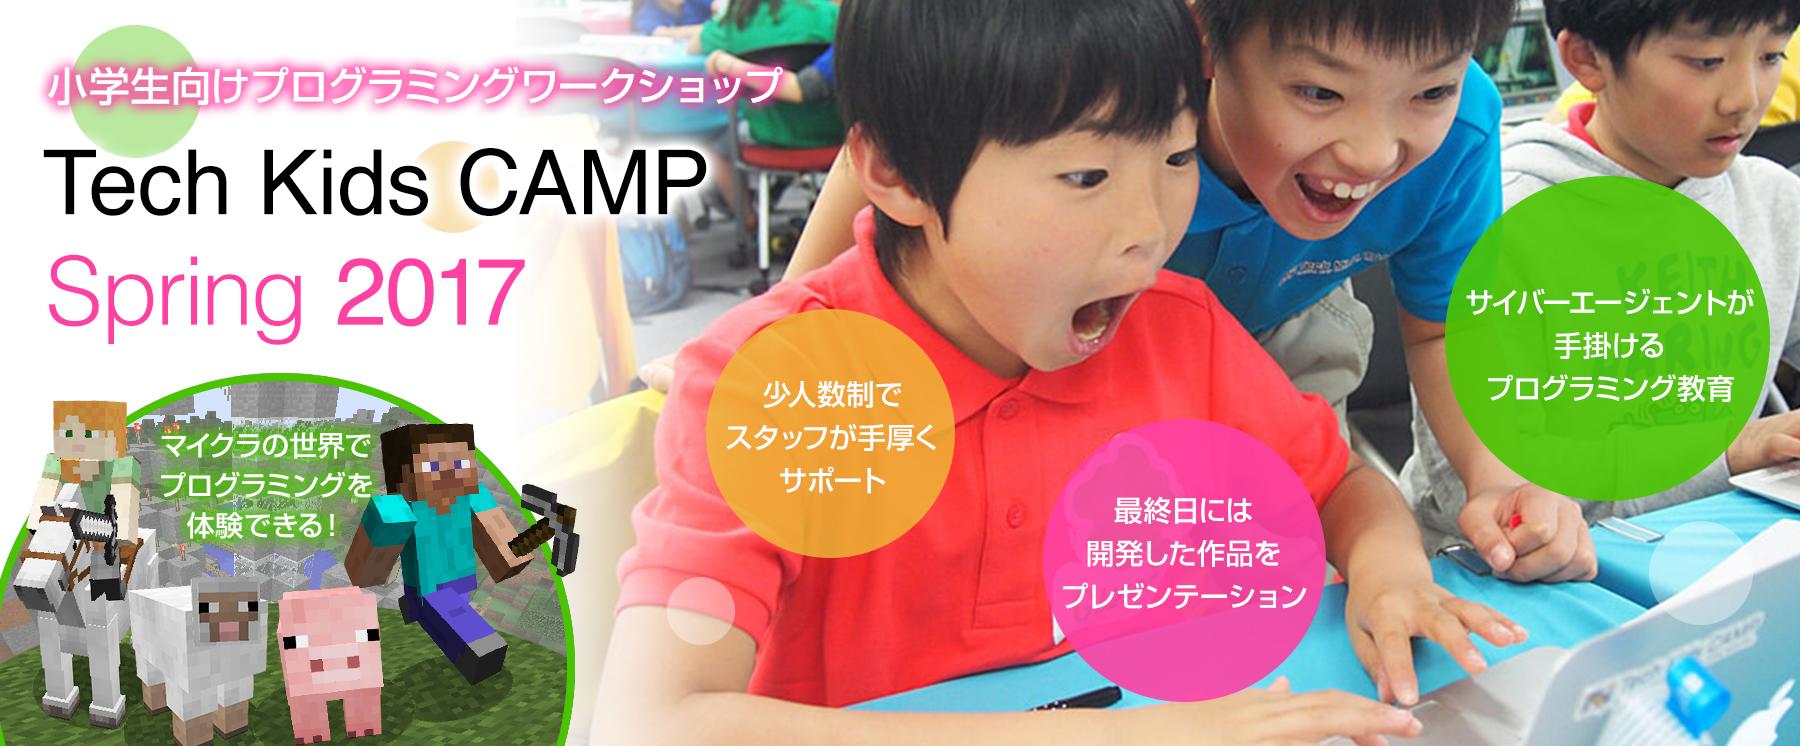 Tech Kids CAMP Spring 2017